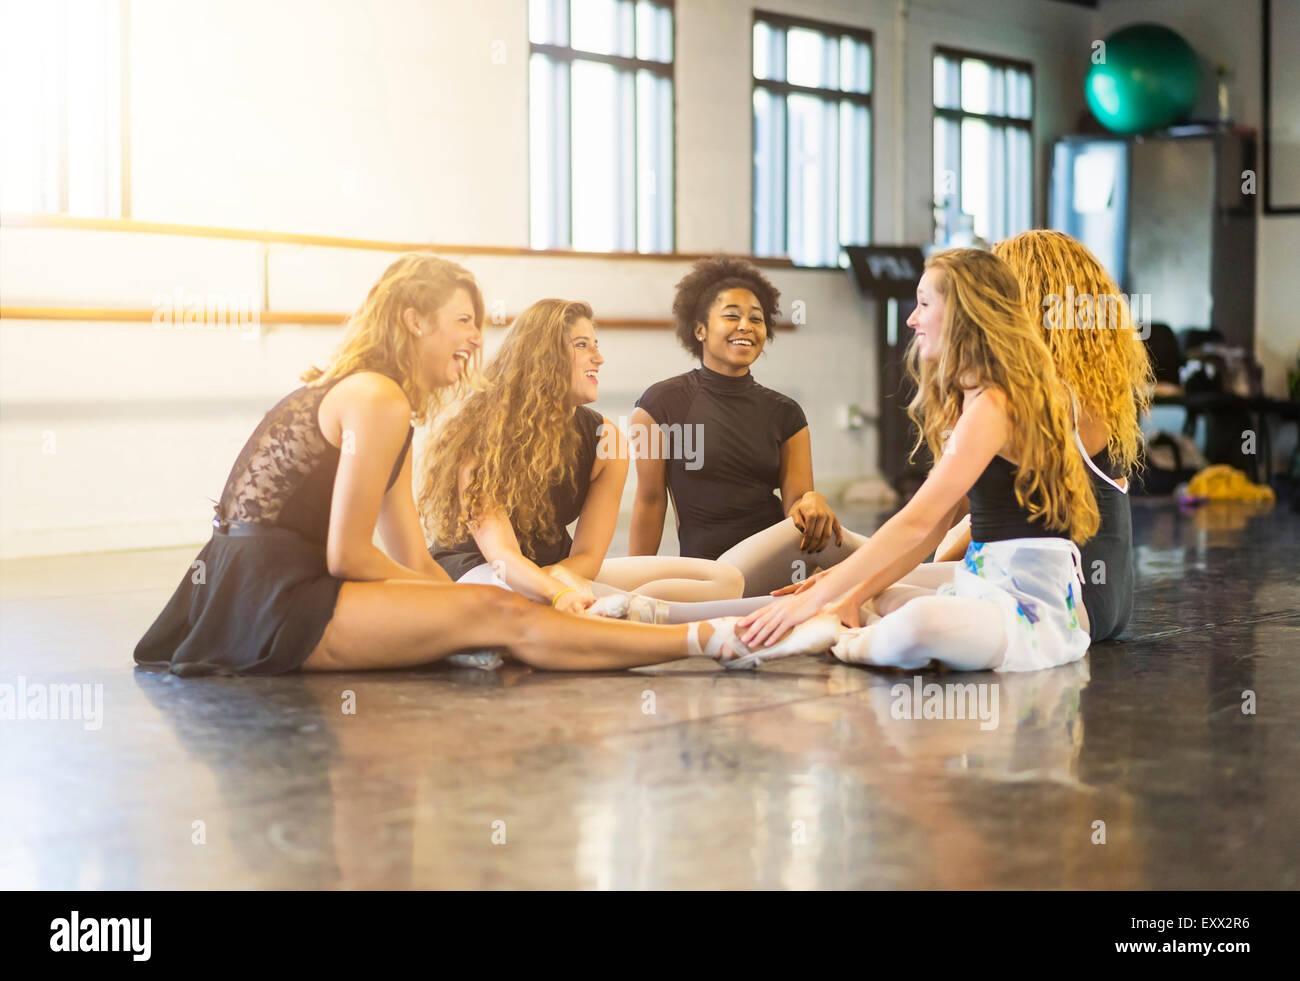 Junge Frauen im Tanzstudio Stockbild